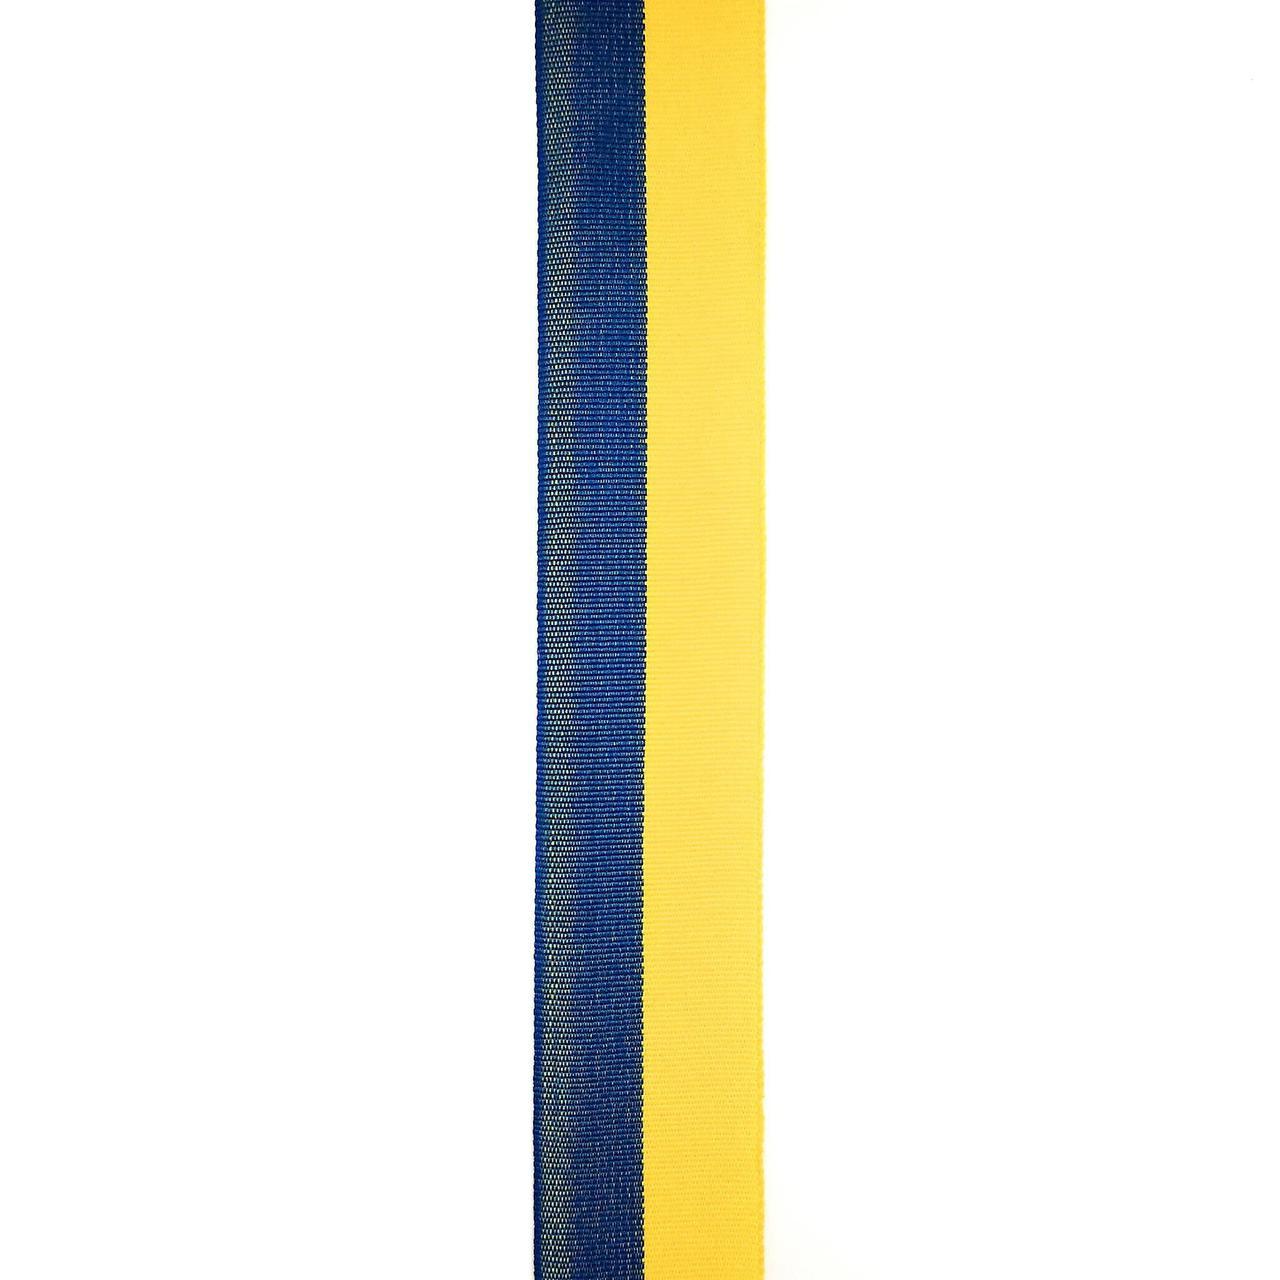 Стрічка національна 30 мм (50м/рулон)